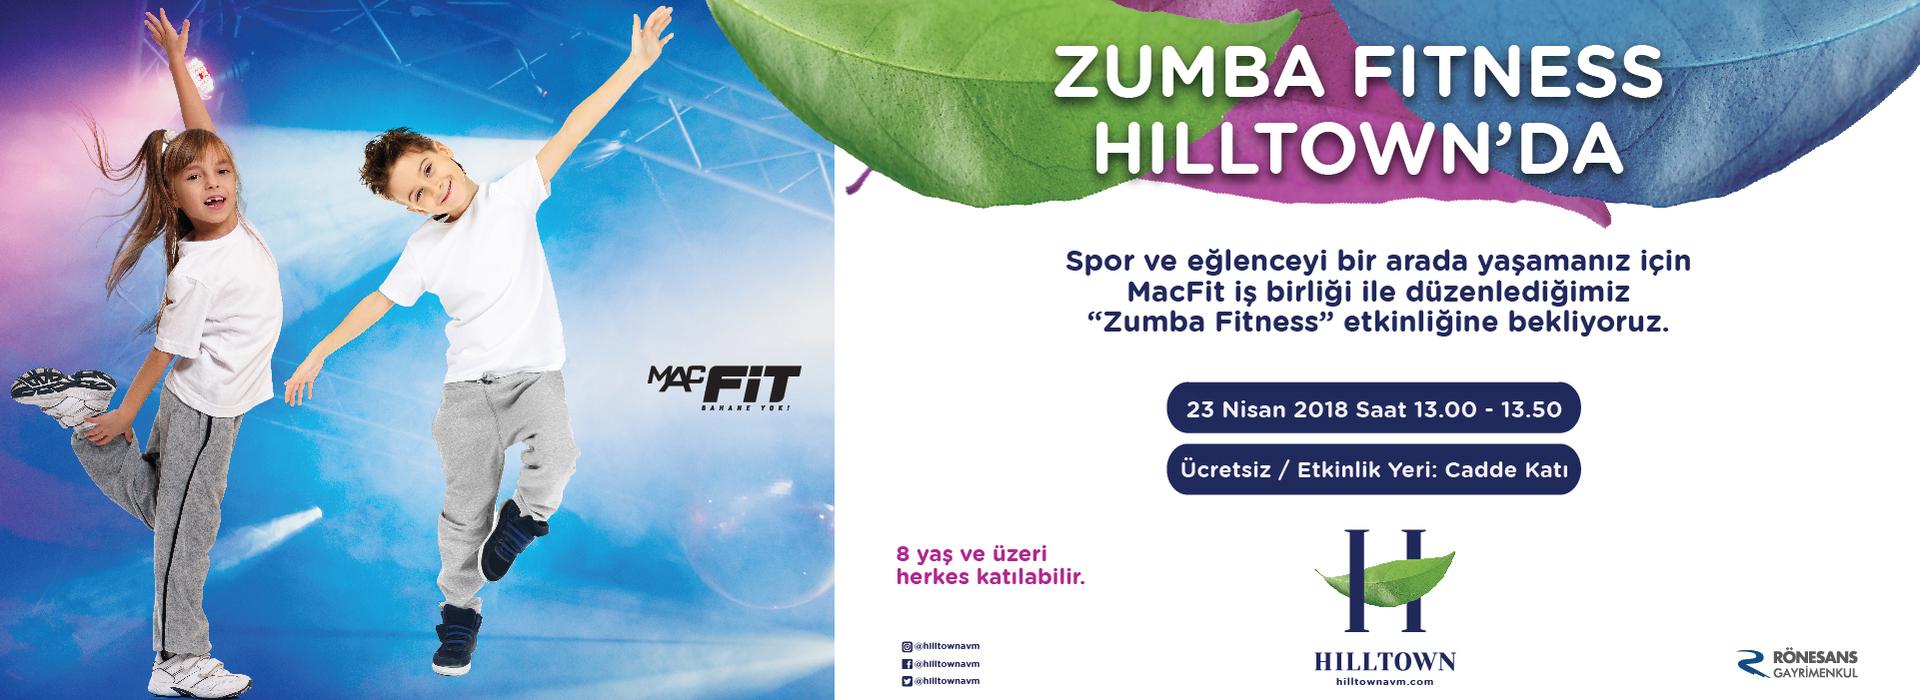 Zumba Fitness Hilltown'da